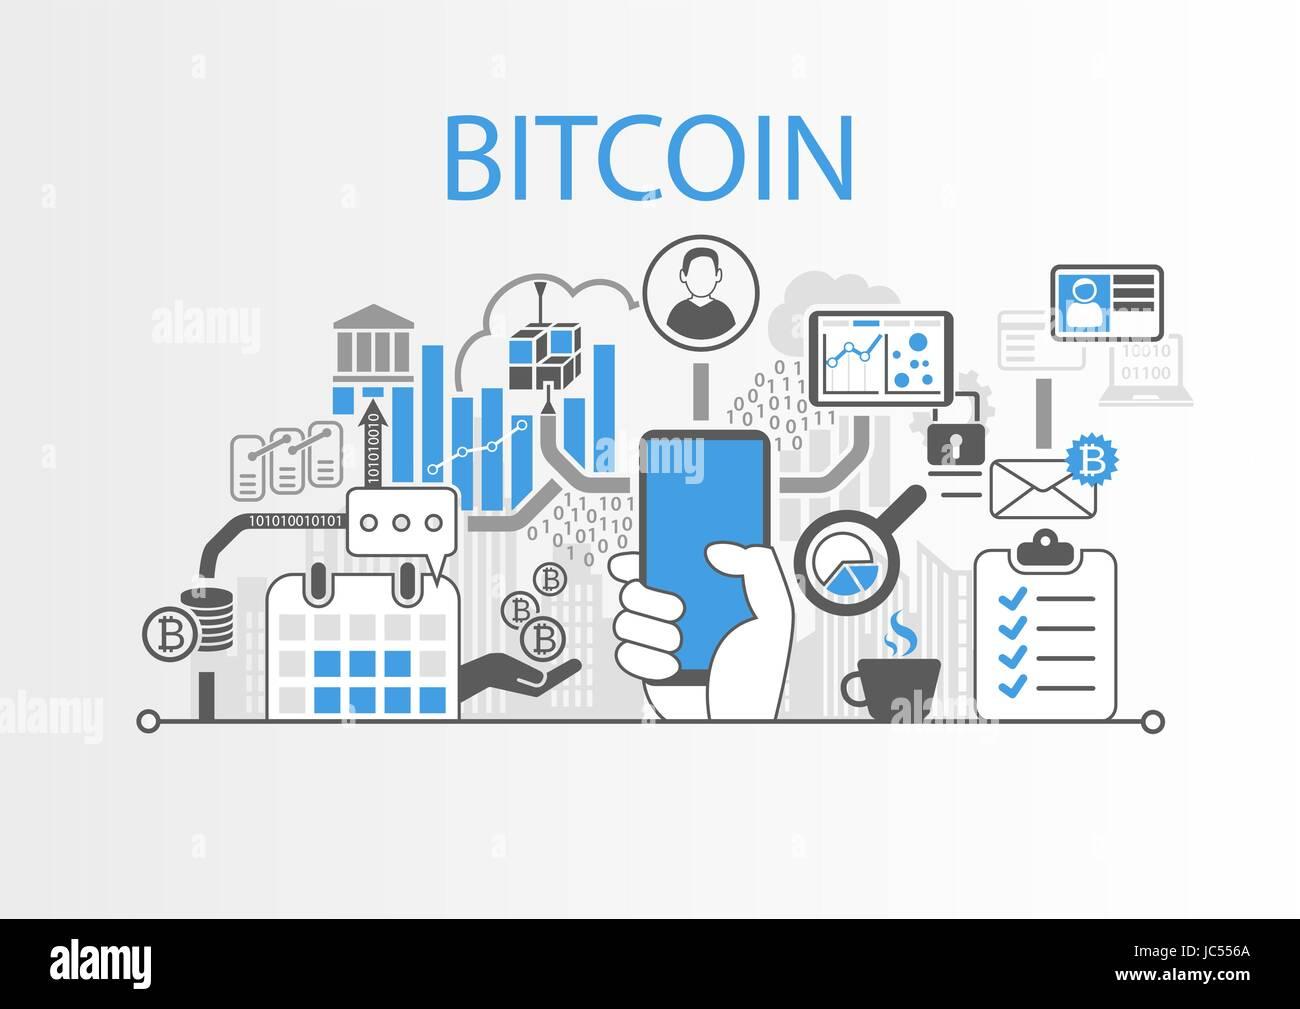 Bitcoin Vektor Hintergrund Illustration mit Hand Smartphone und Symbole Stockbild